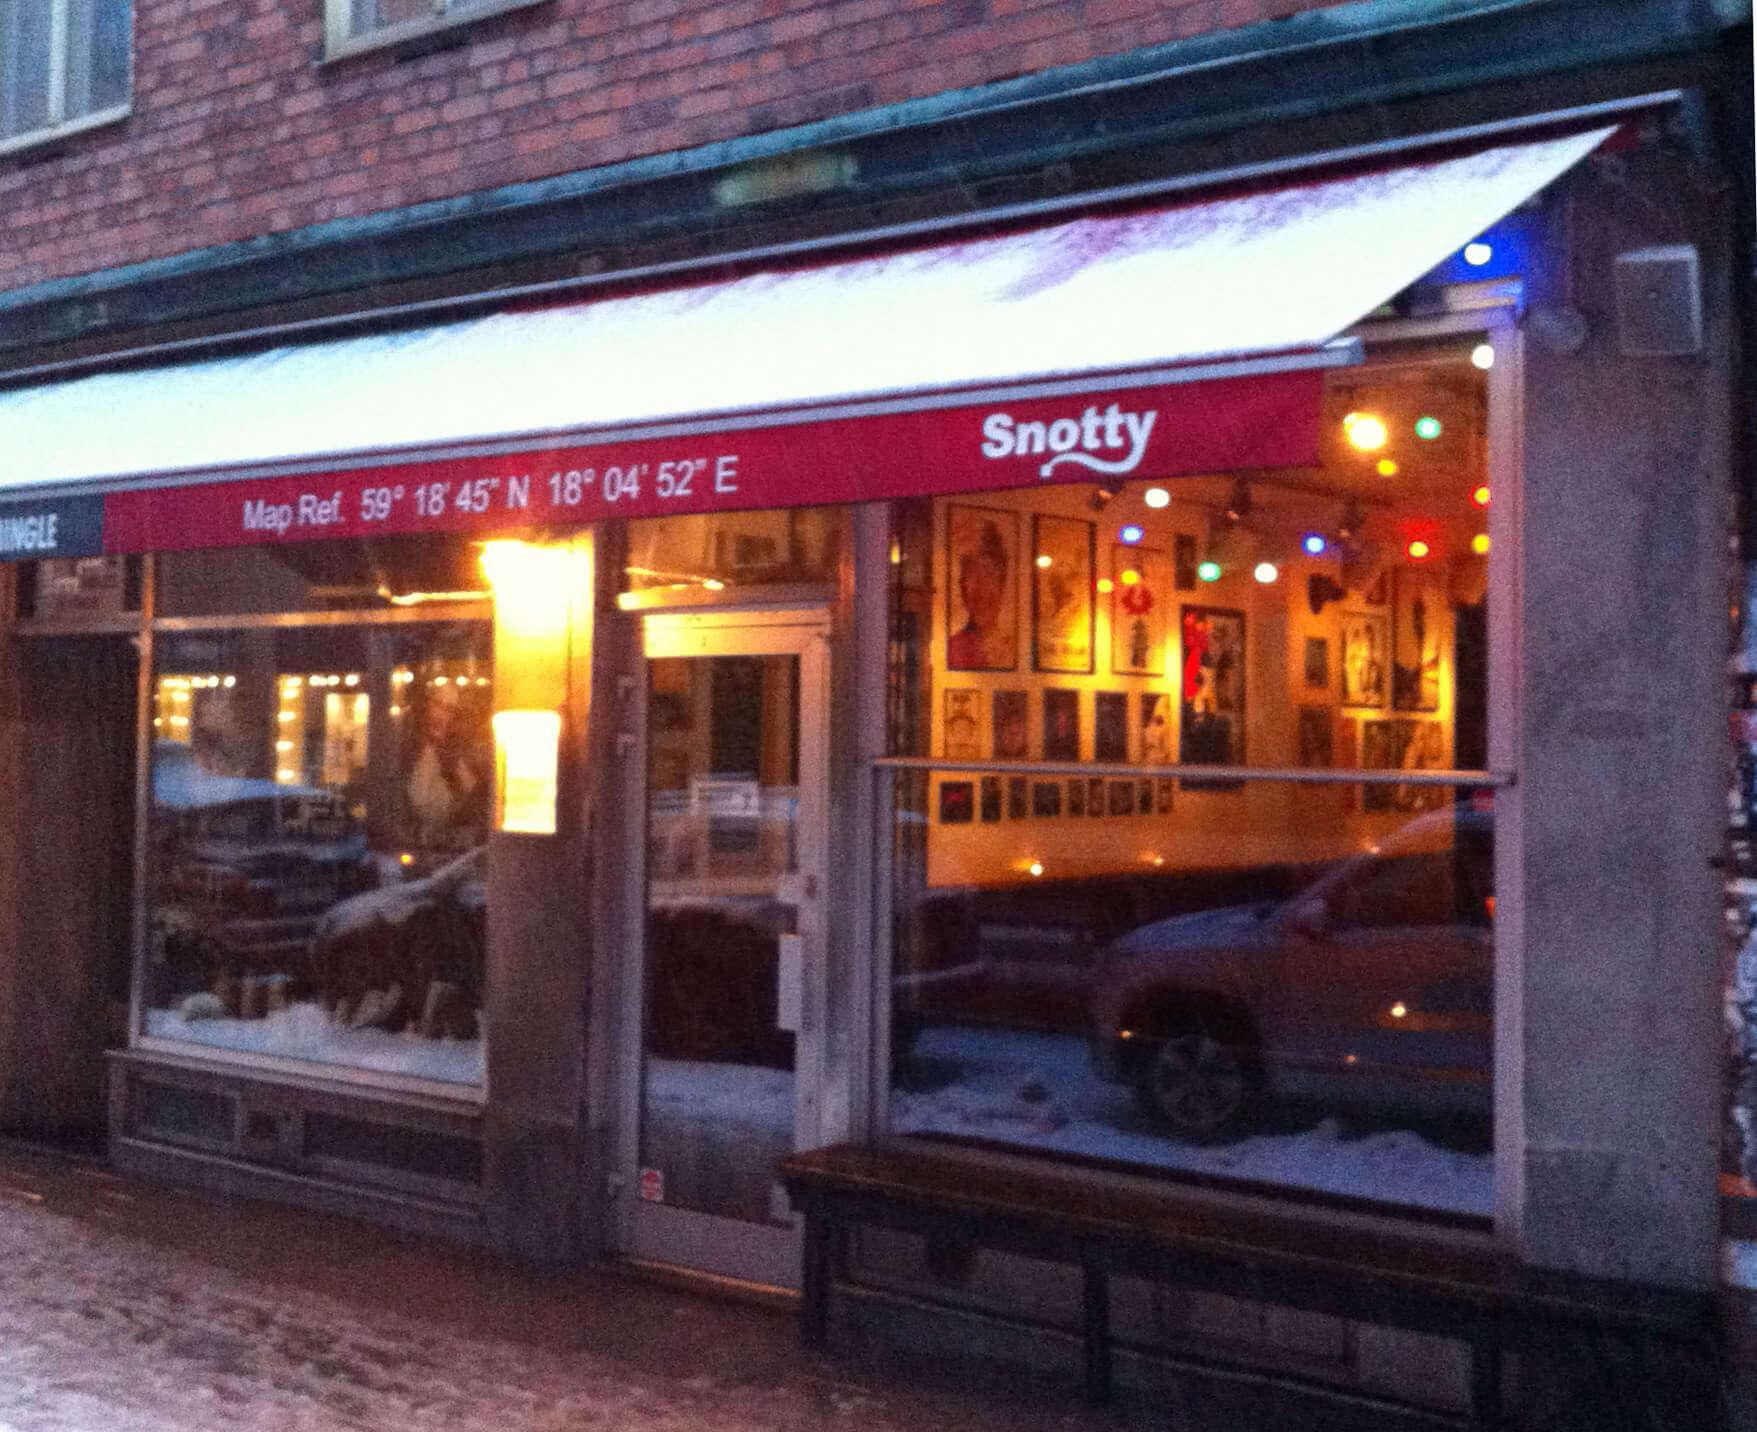 Snotty Sound Bar is a tiny cozy bar